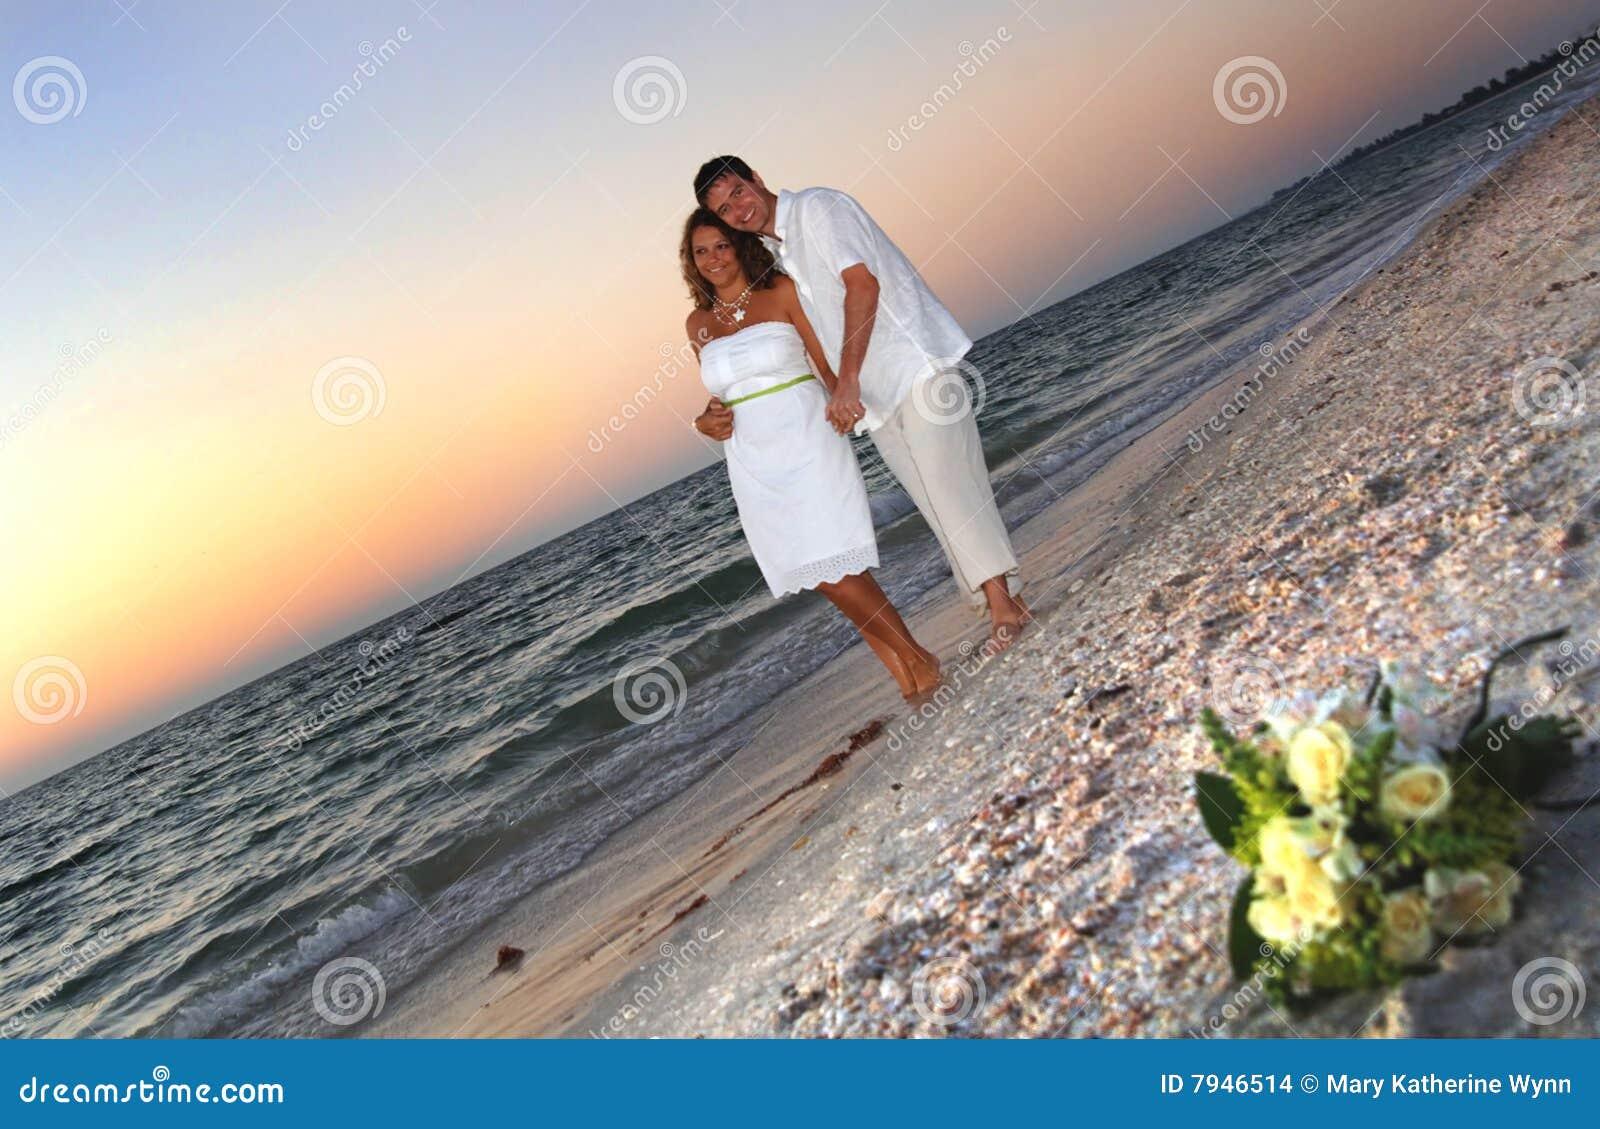 Tropical Beach wedding couple